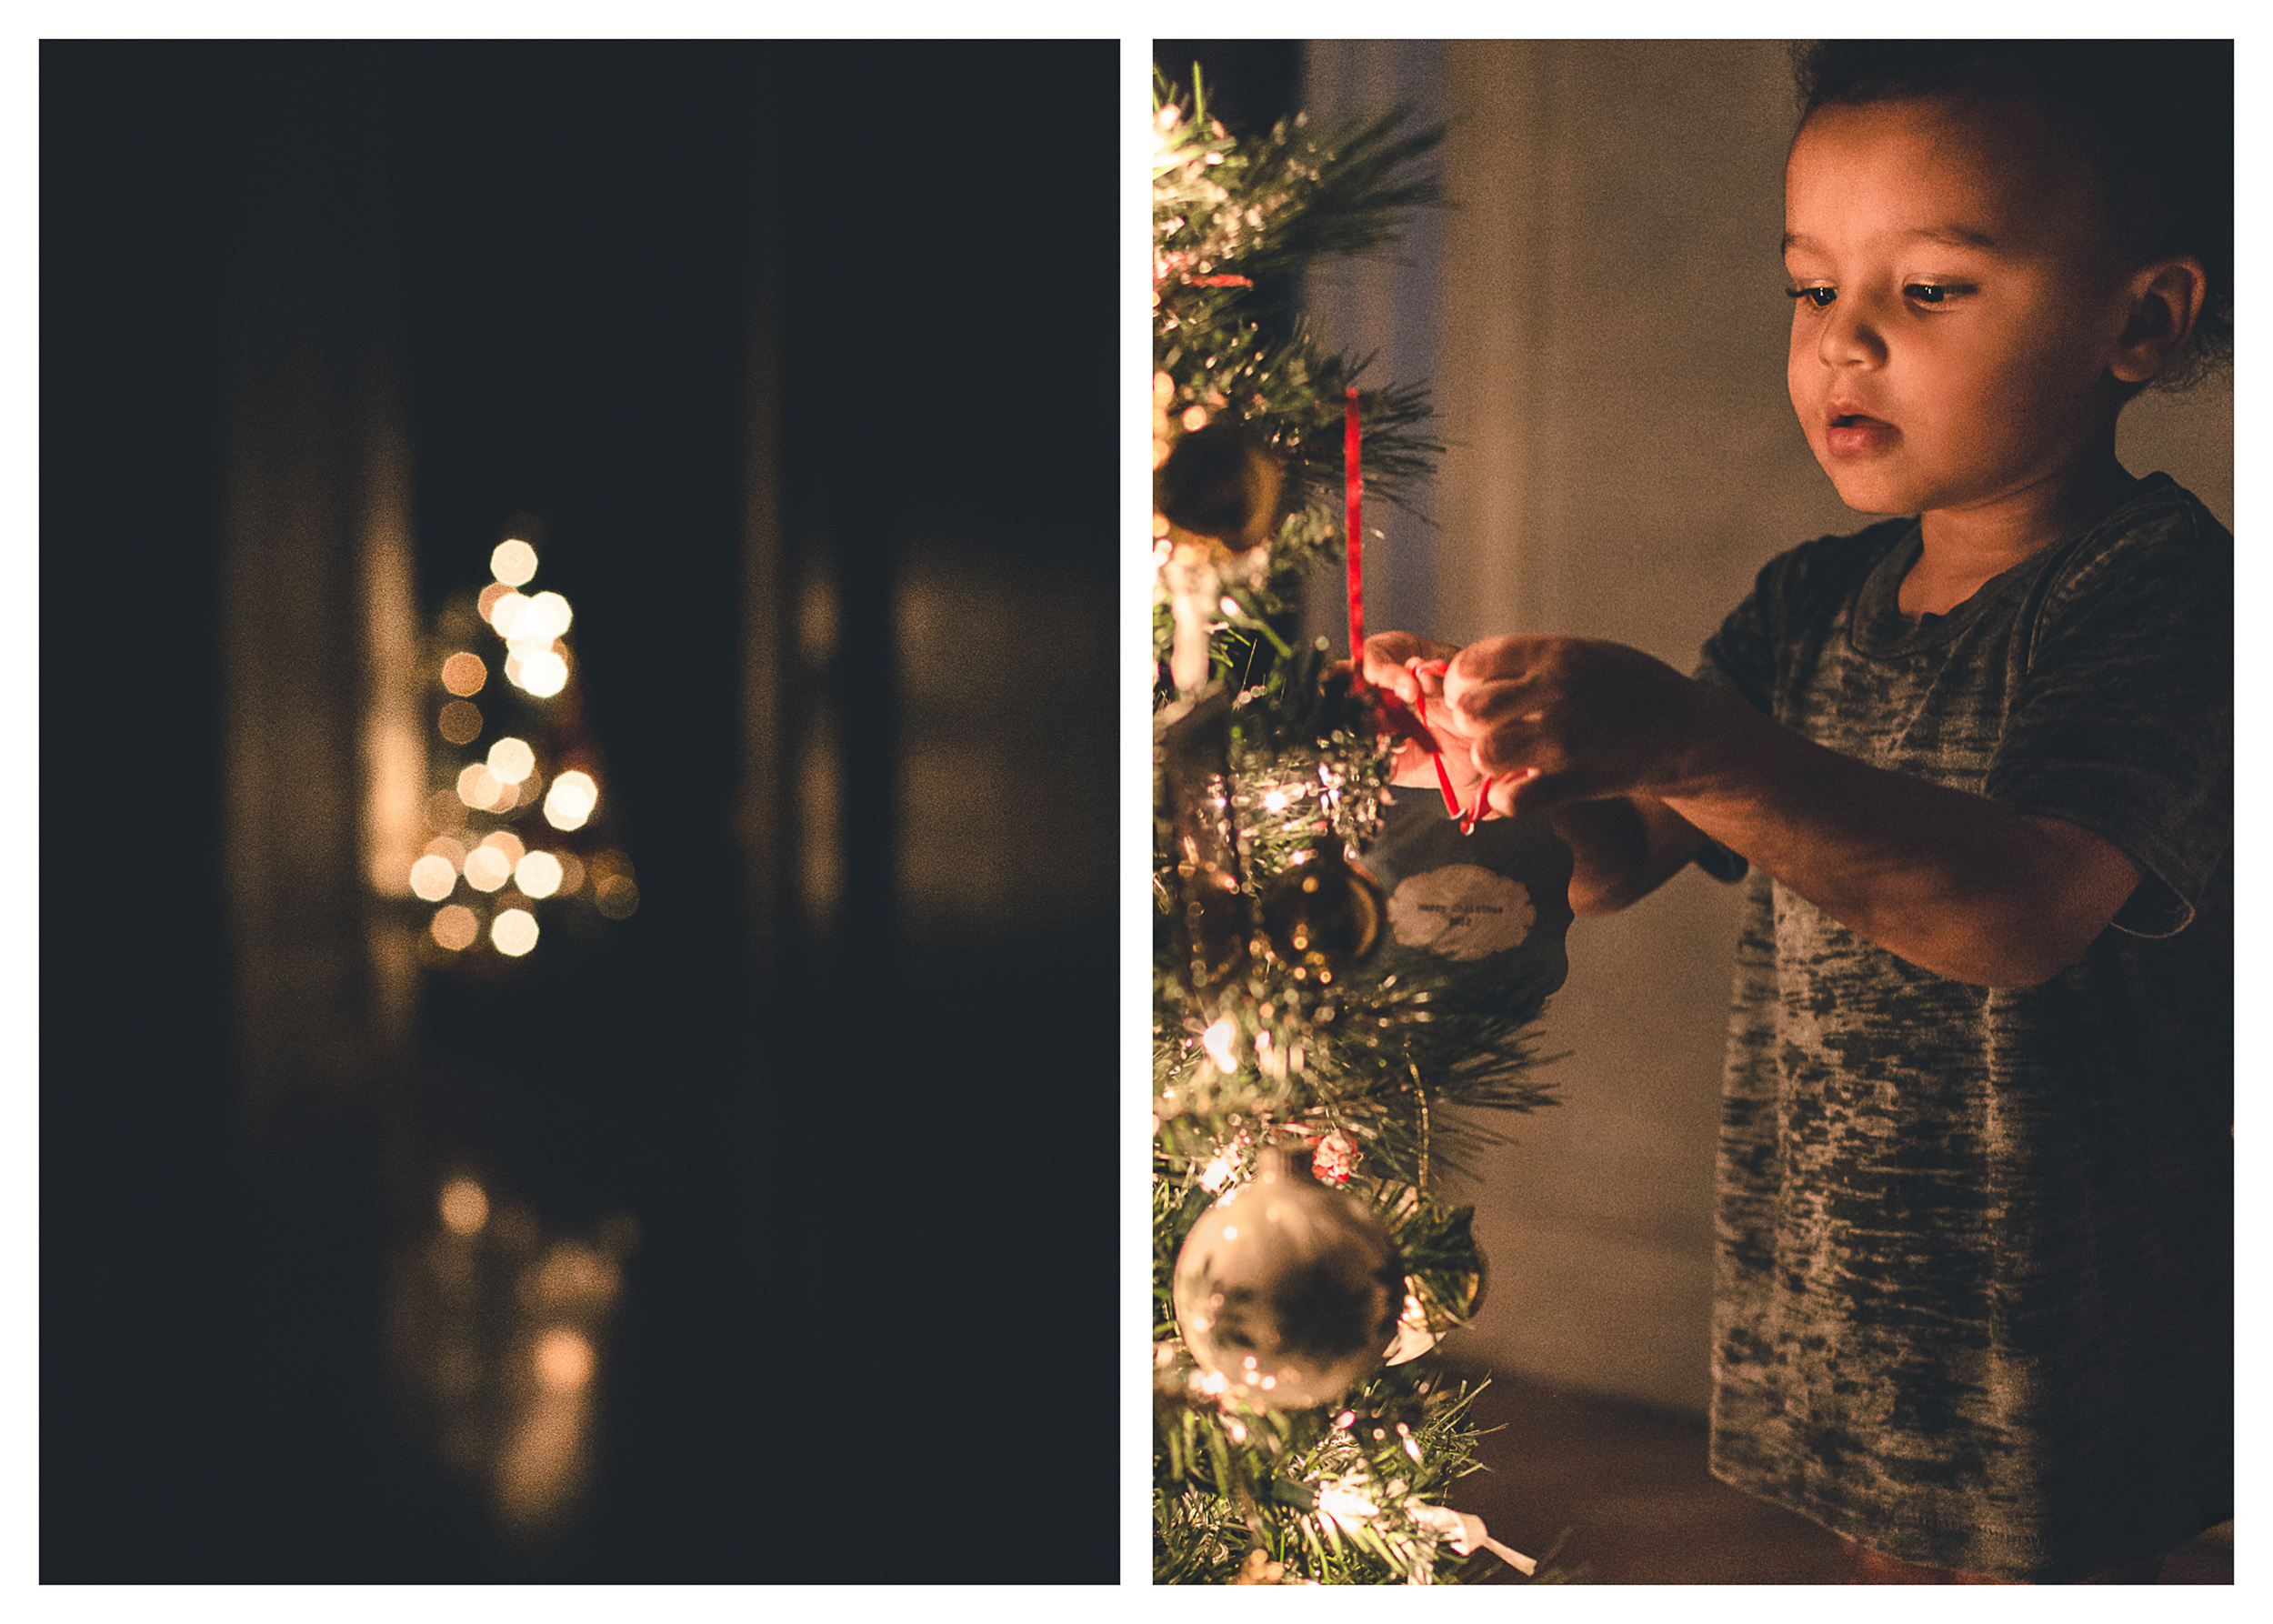 Small tree, little boy wonder